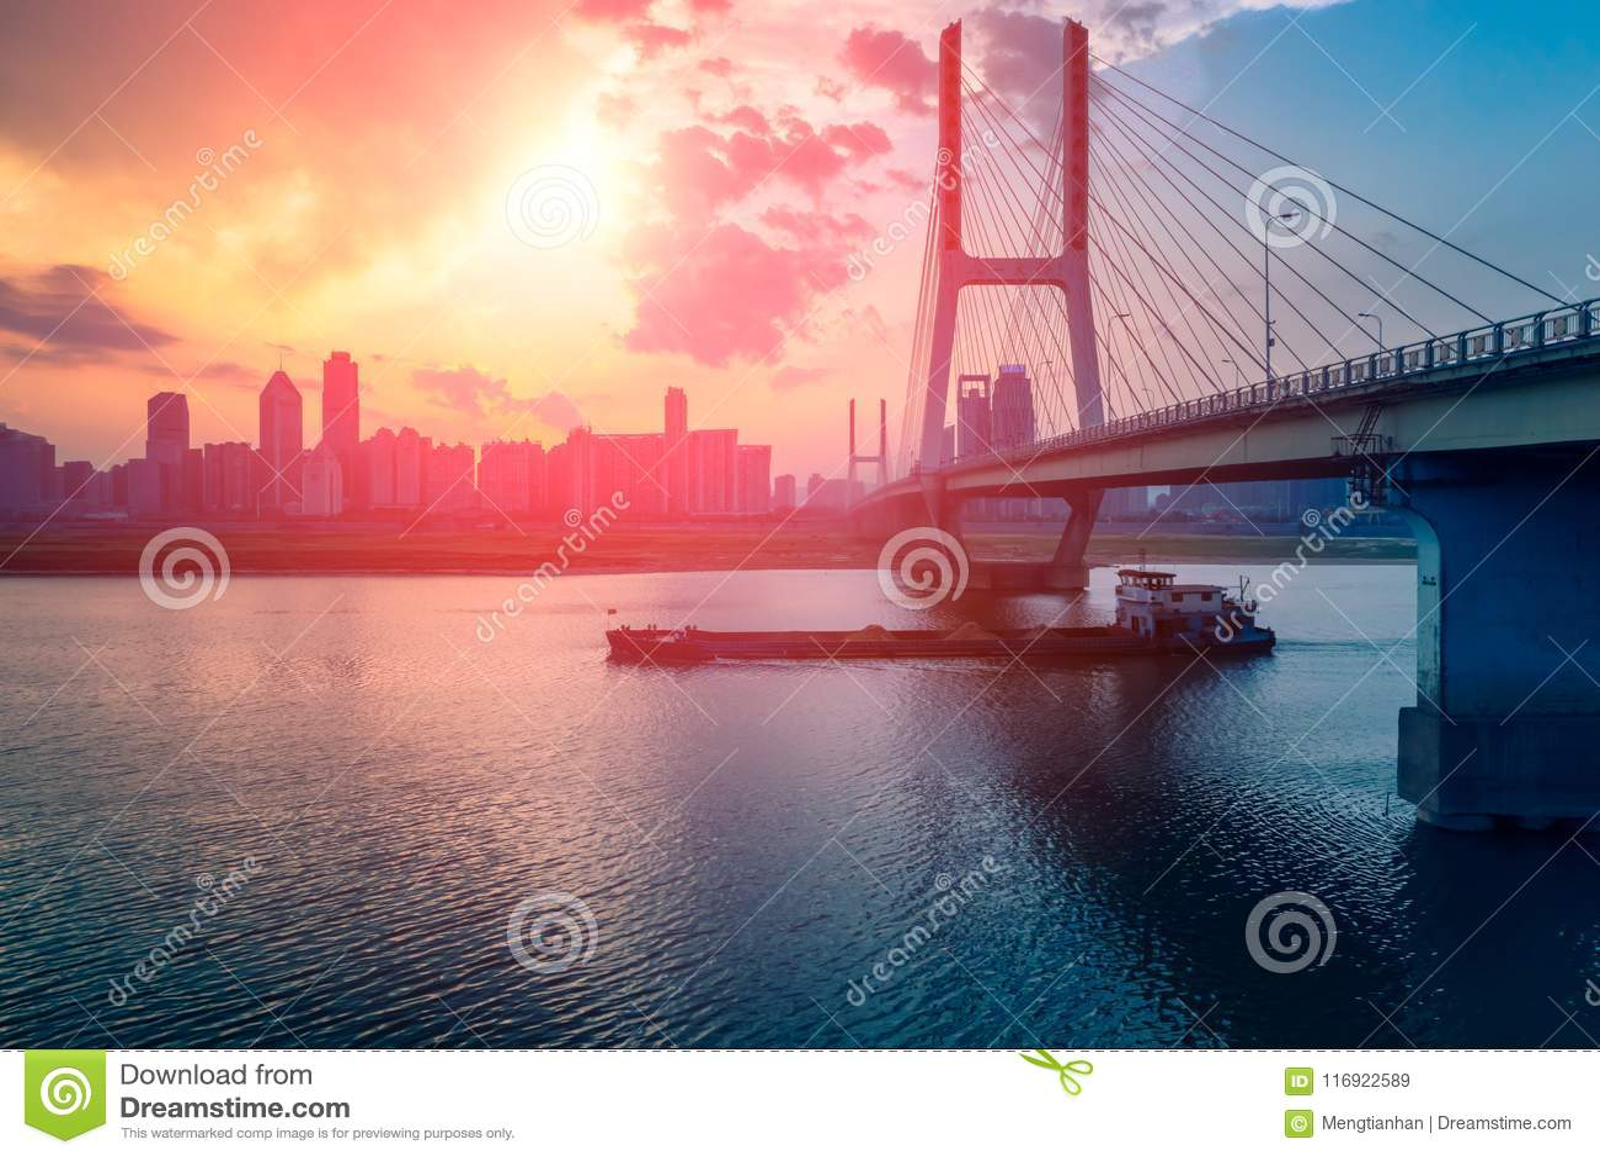 Pont de lueur-Nan-Tchang Bayi de coucher du soleil